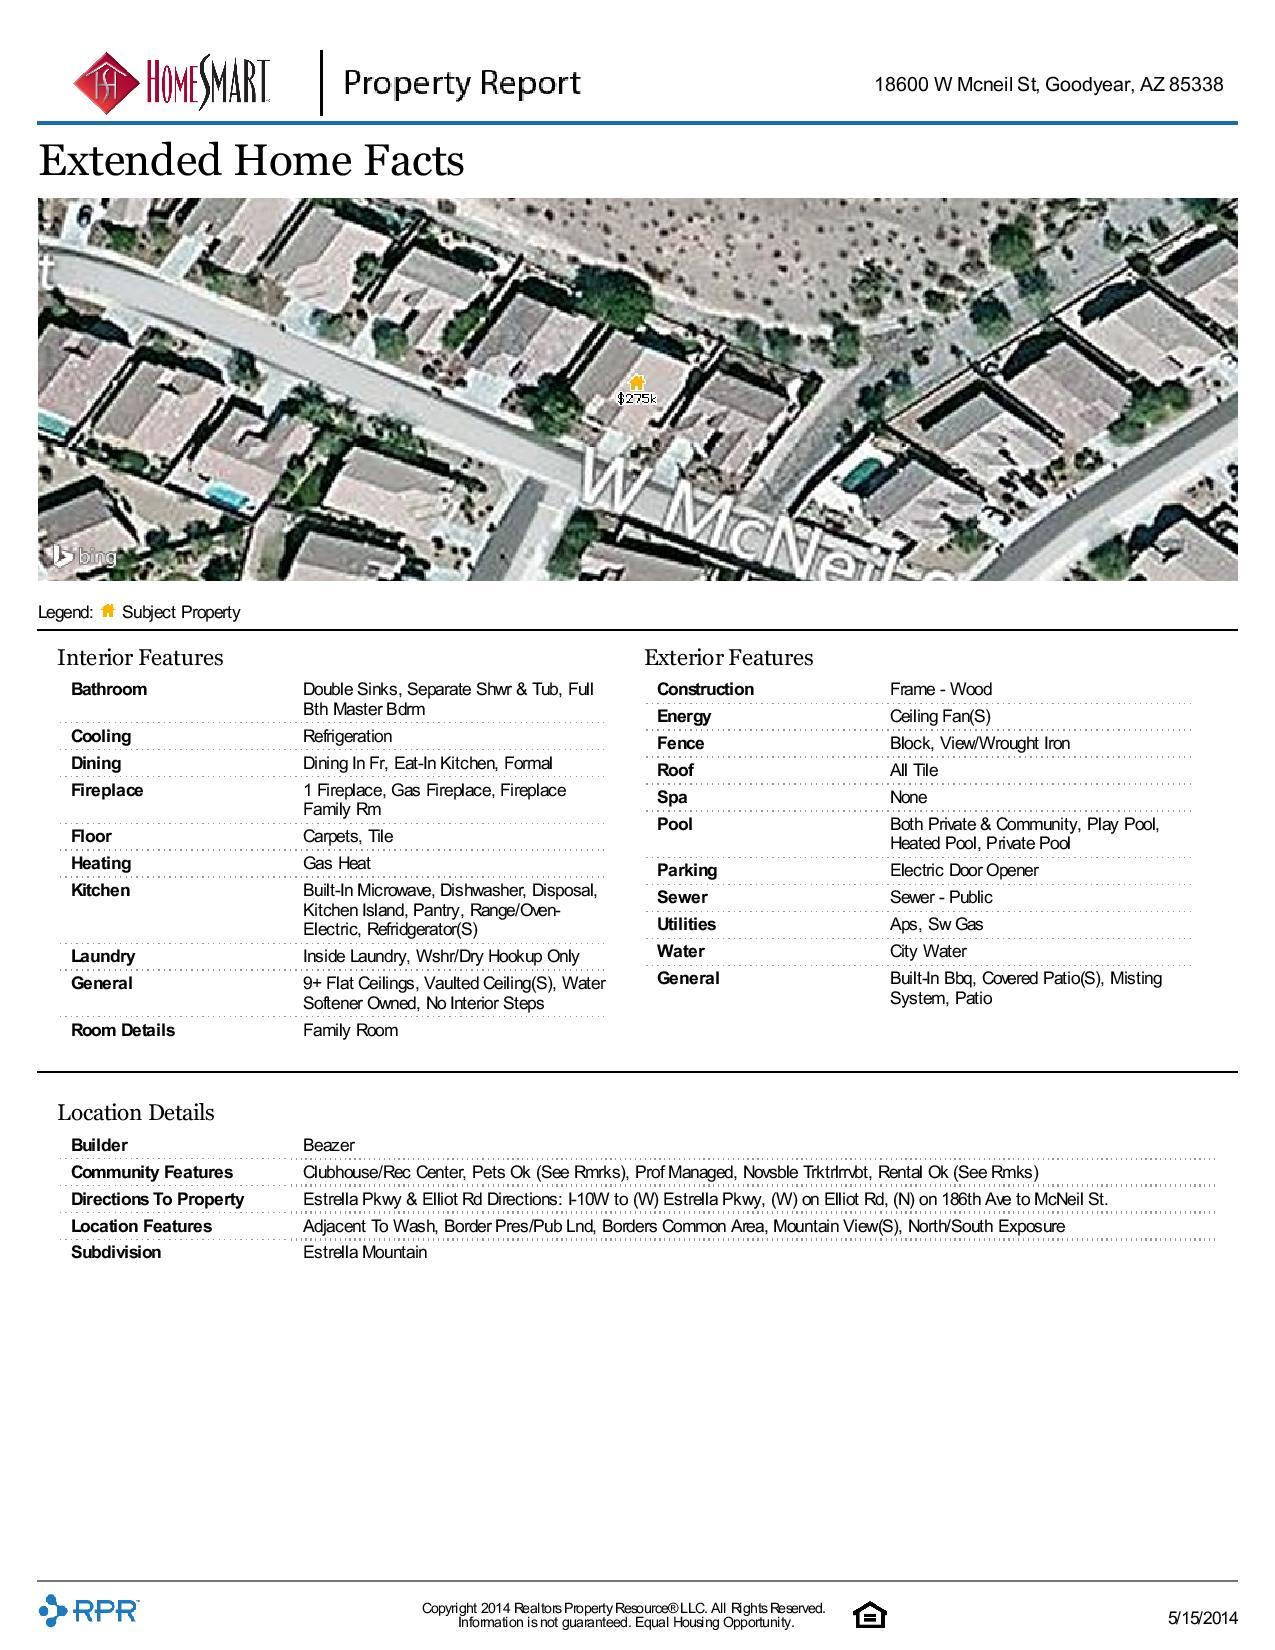 18600-W-Mcneil-St-Goodyear-AZ-85338-page-004